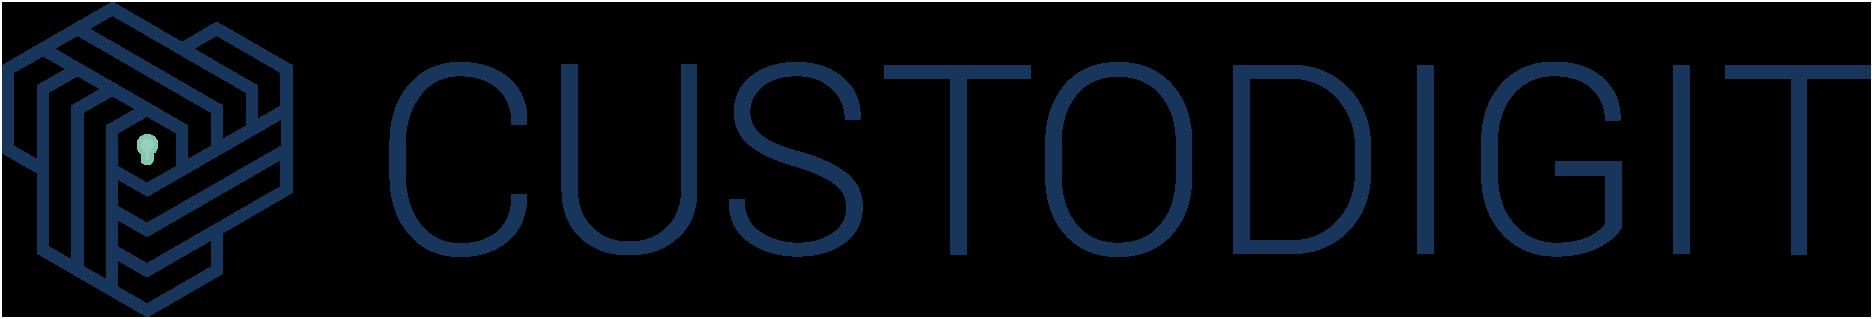 custodigit_logo_blue.png